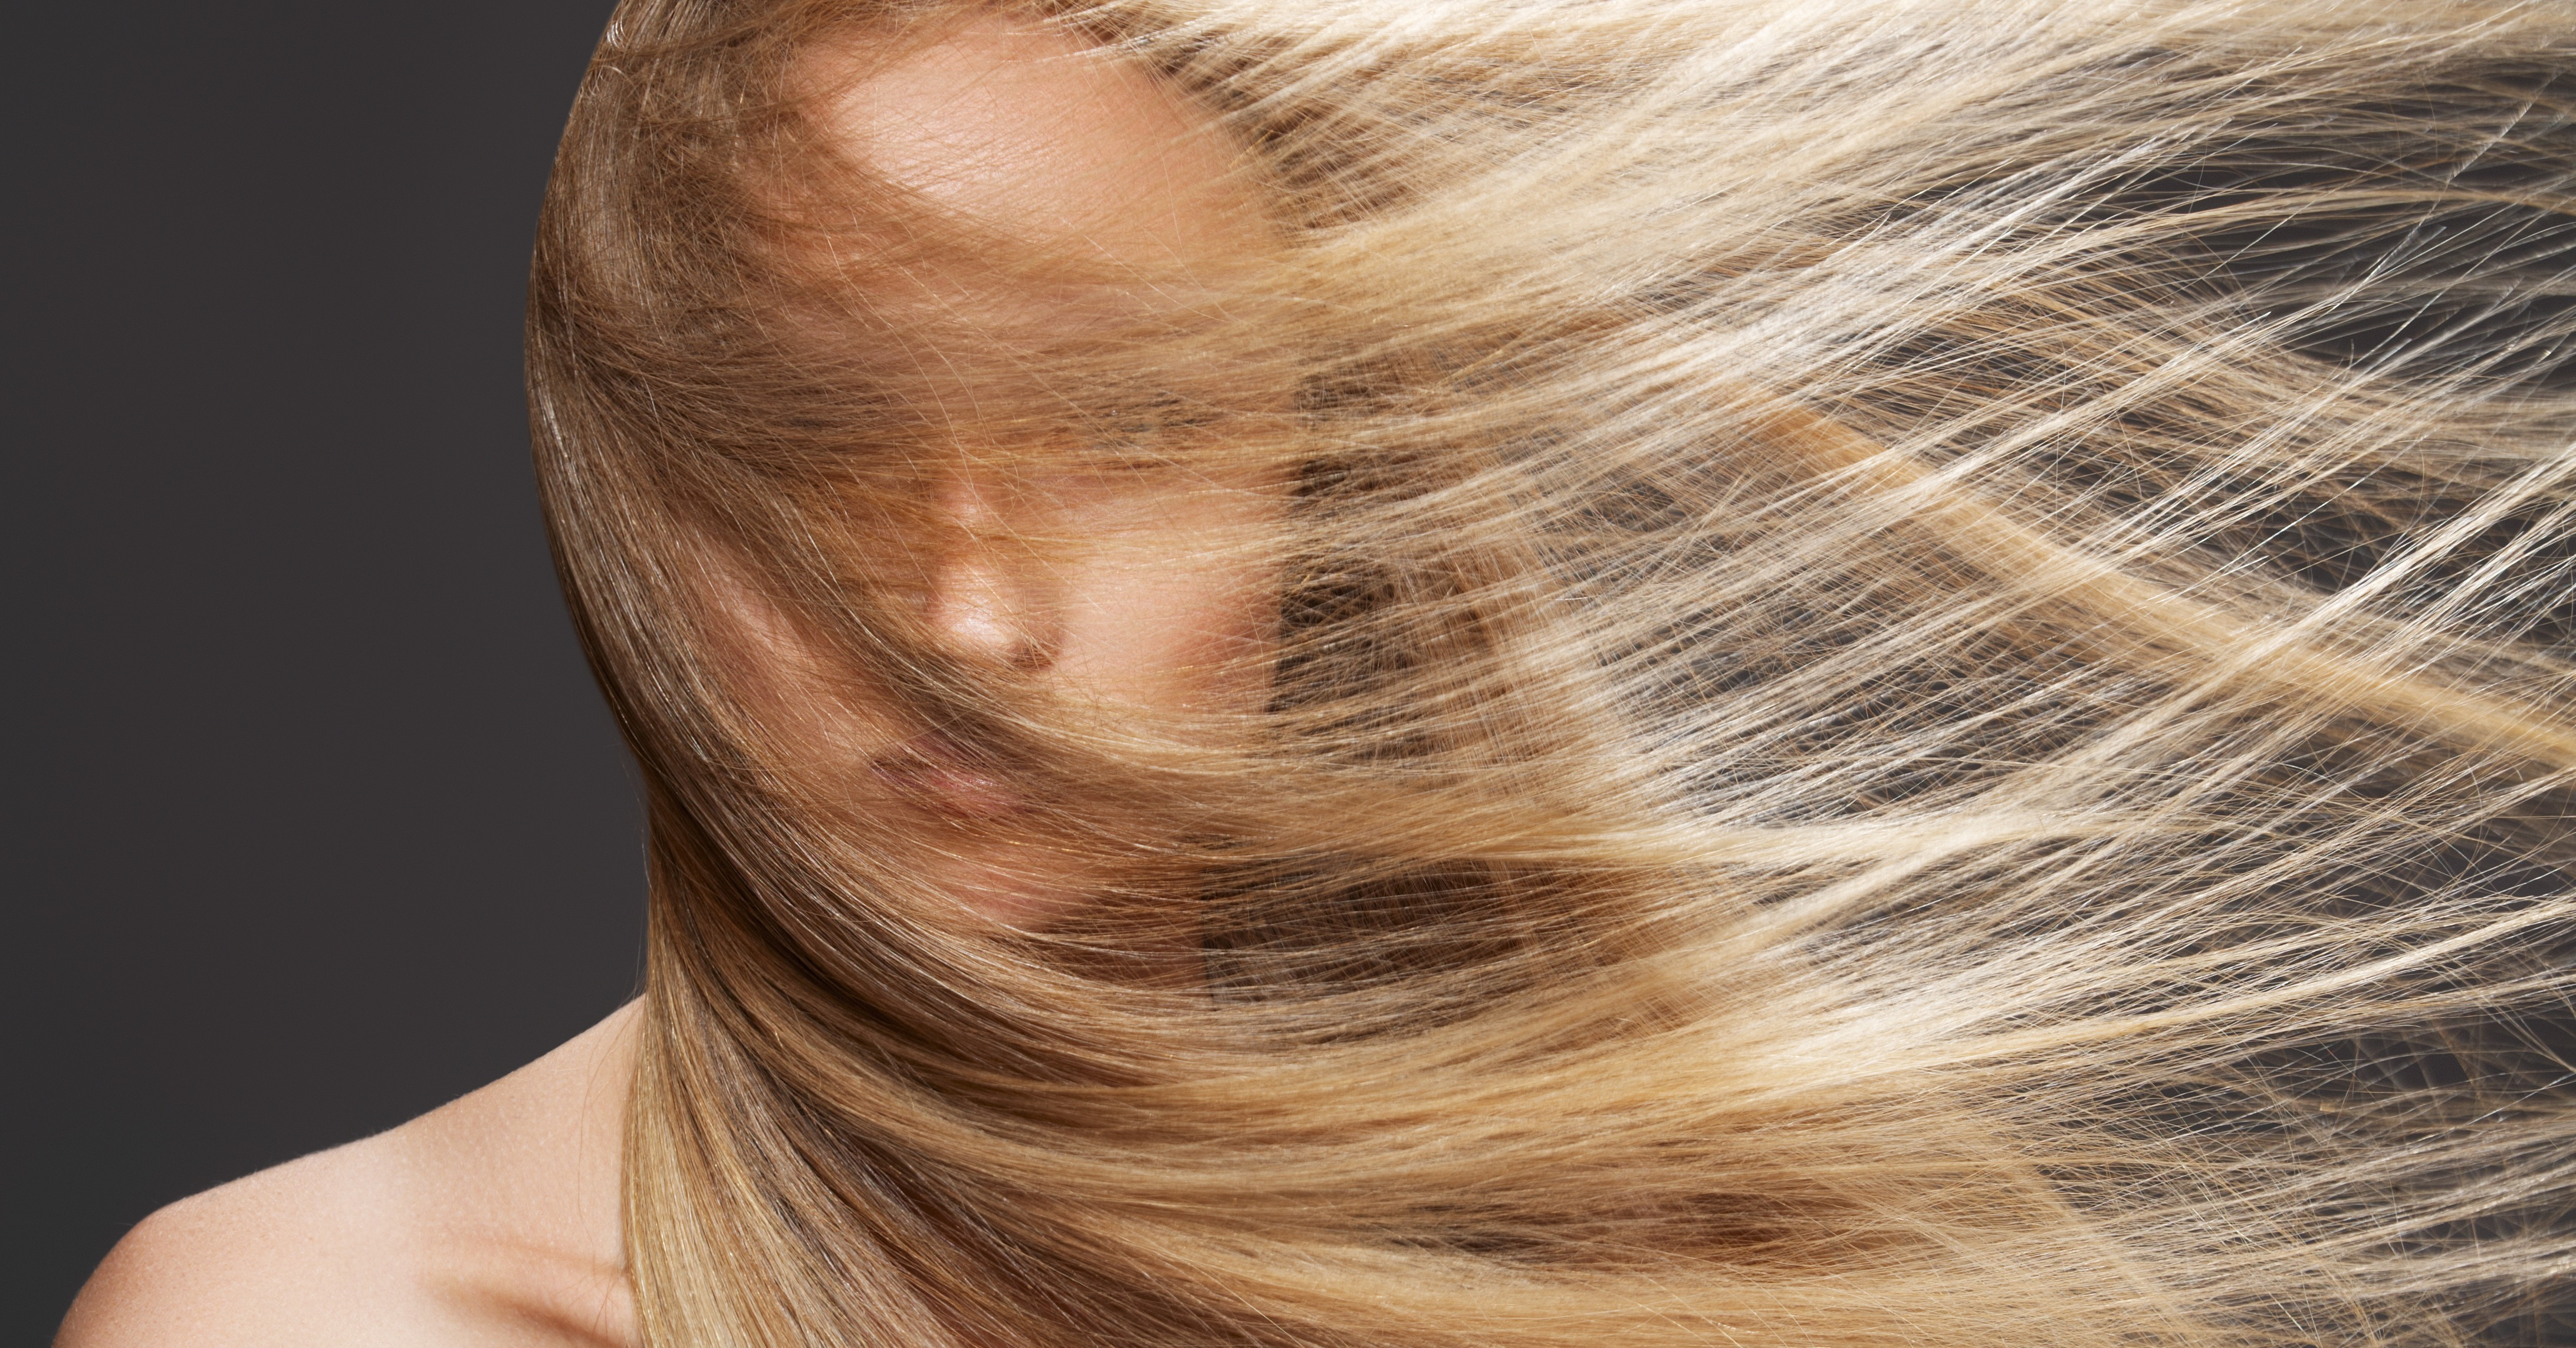 fresh-wind-blowing-through-your-hair-boat-Cousin-mayhem